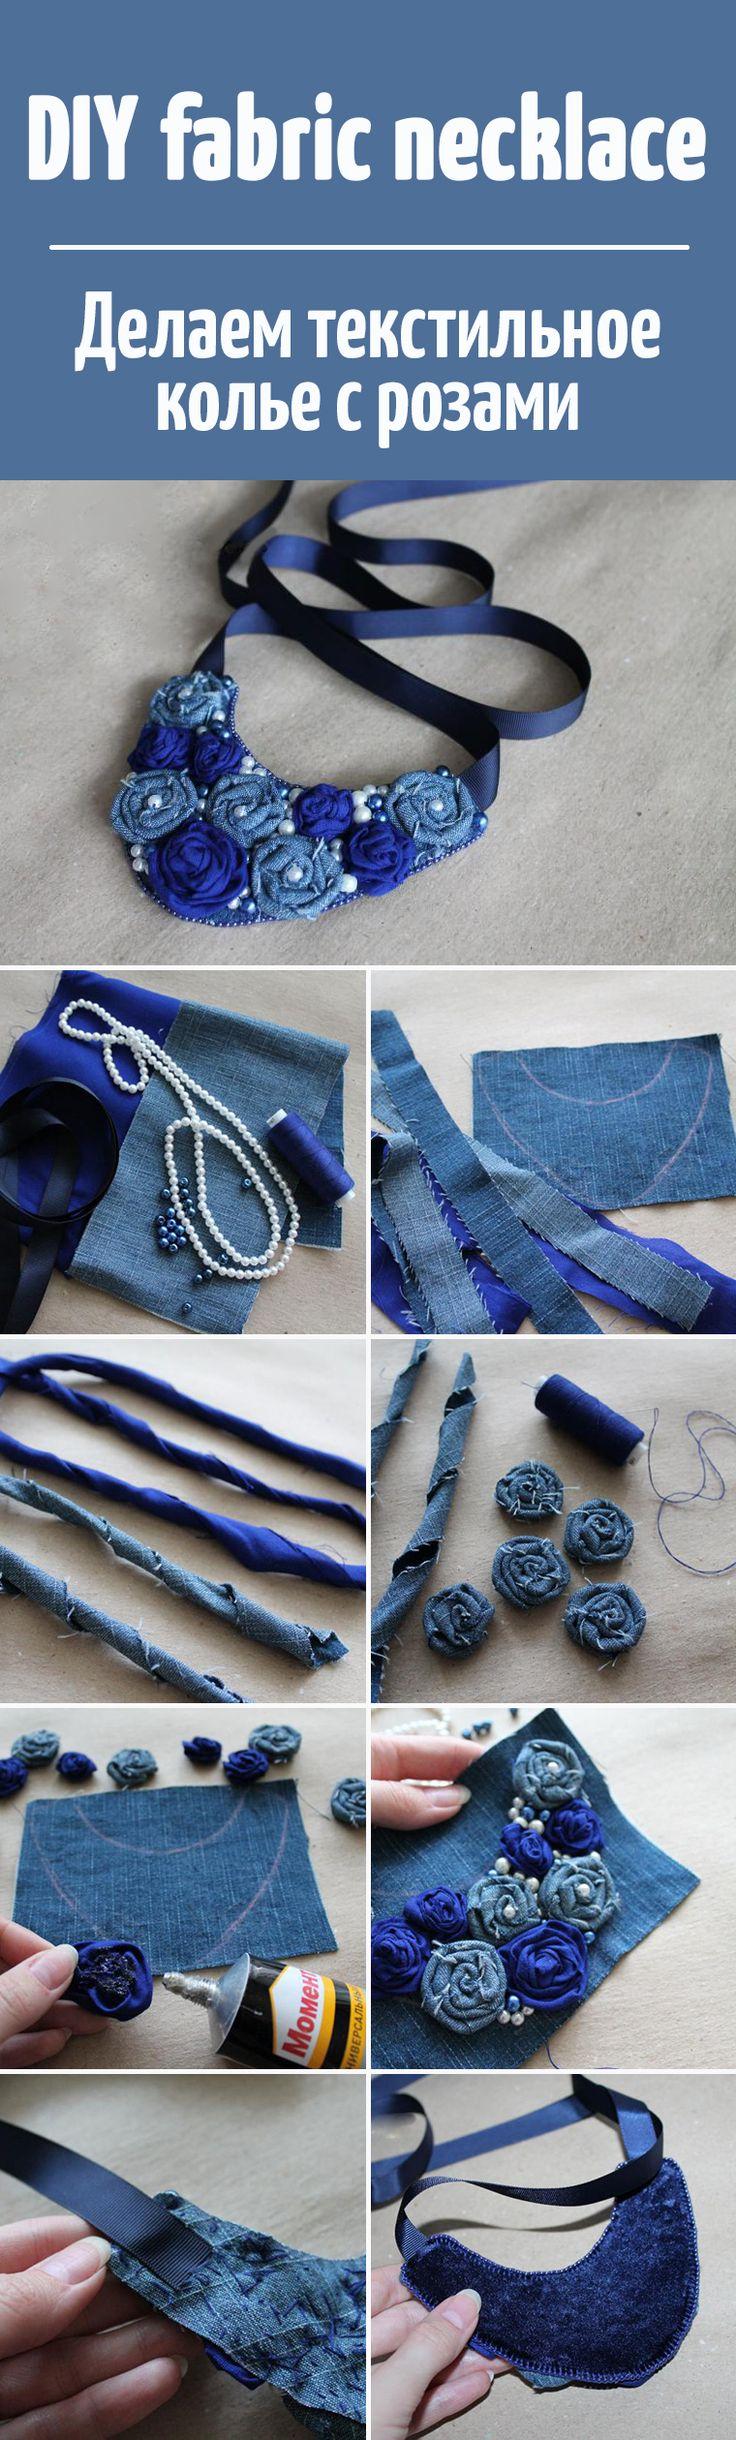 Fabric necklace tutorial